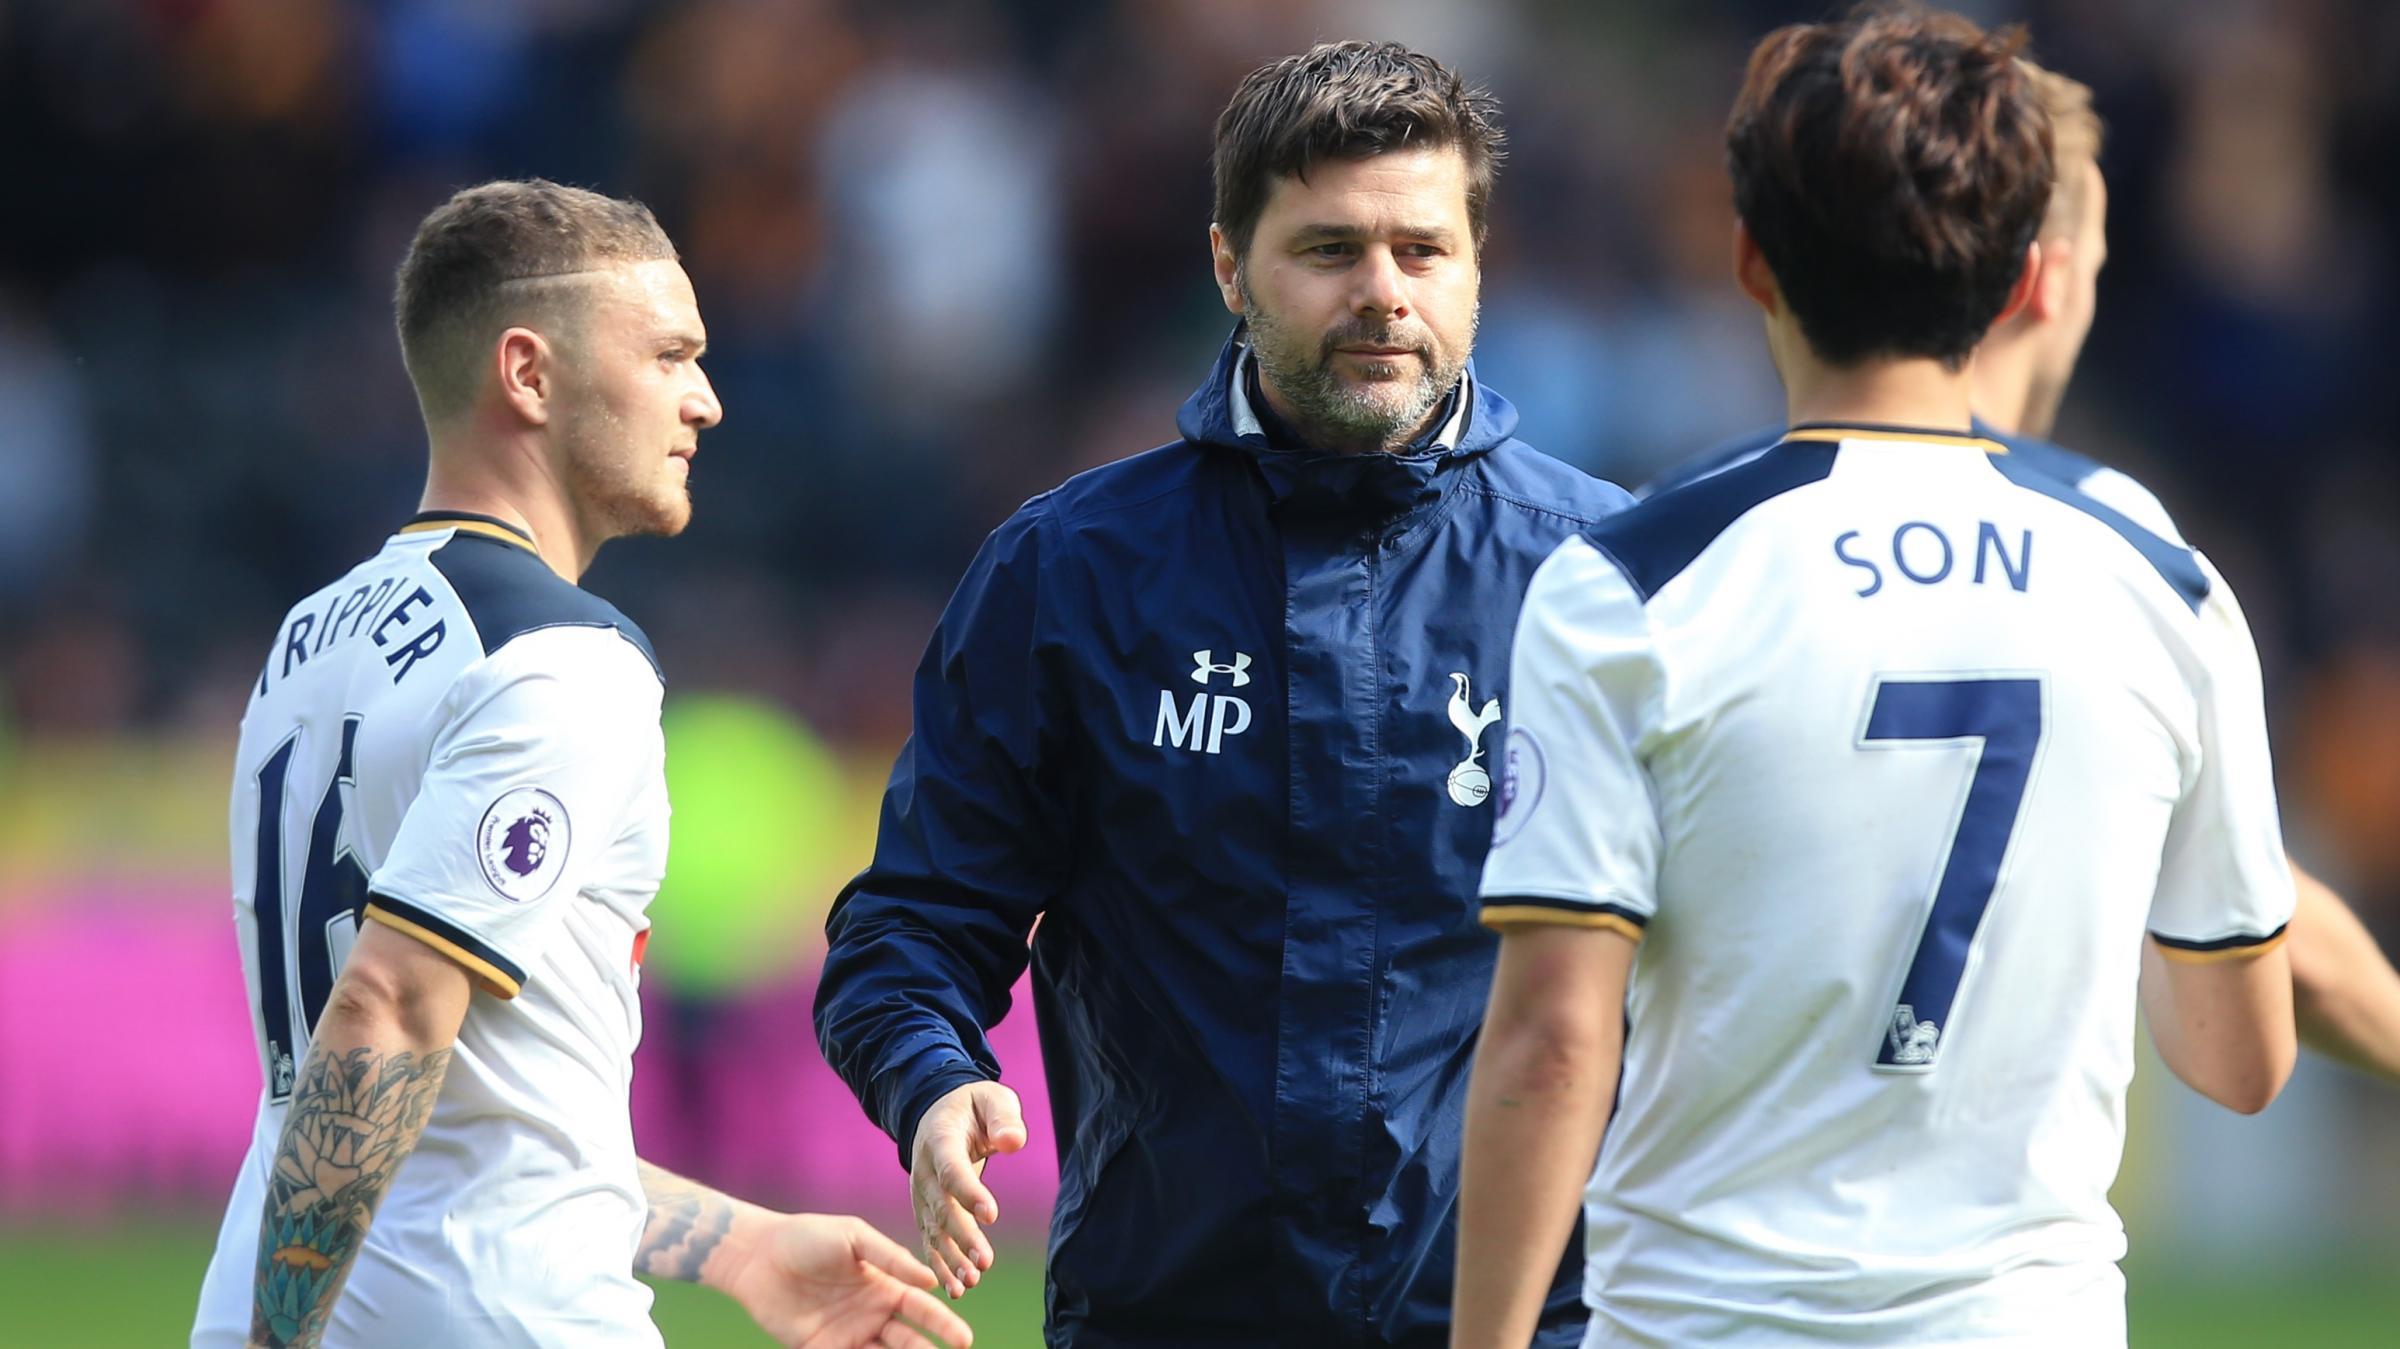 Chelsea 1st to visit Tottenham at Wembley in Premier League